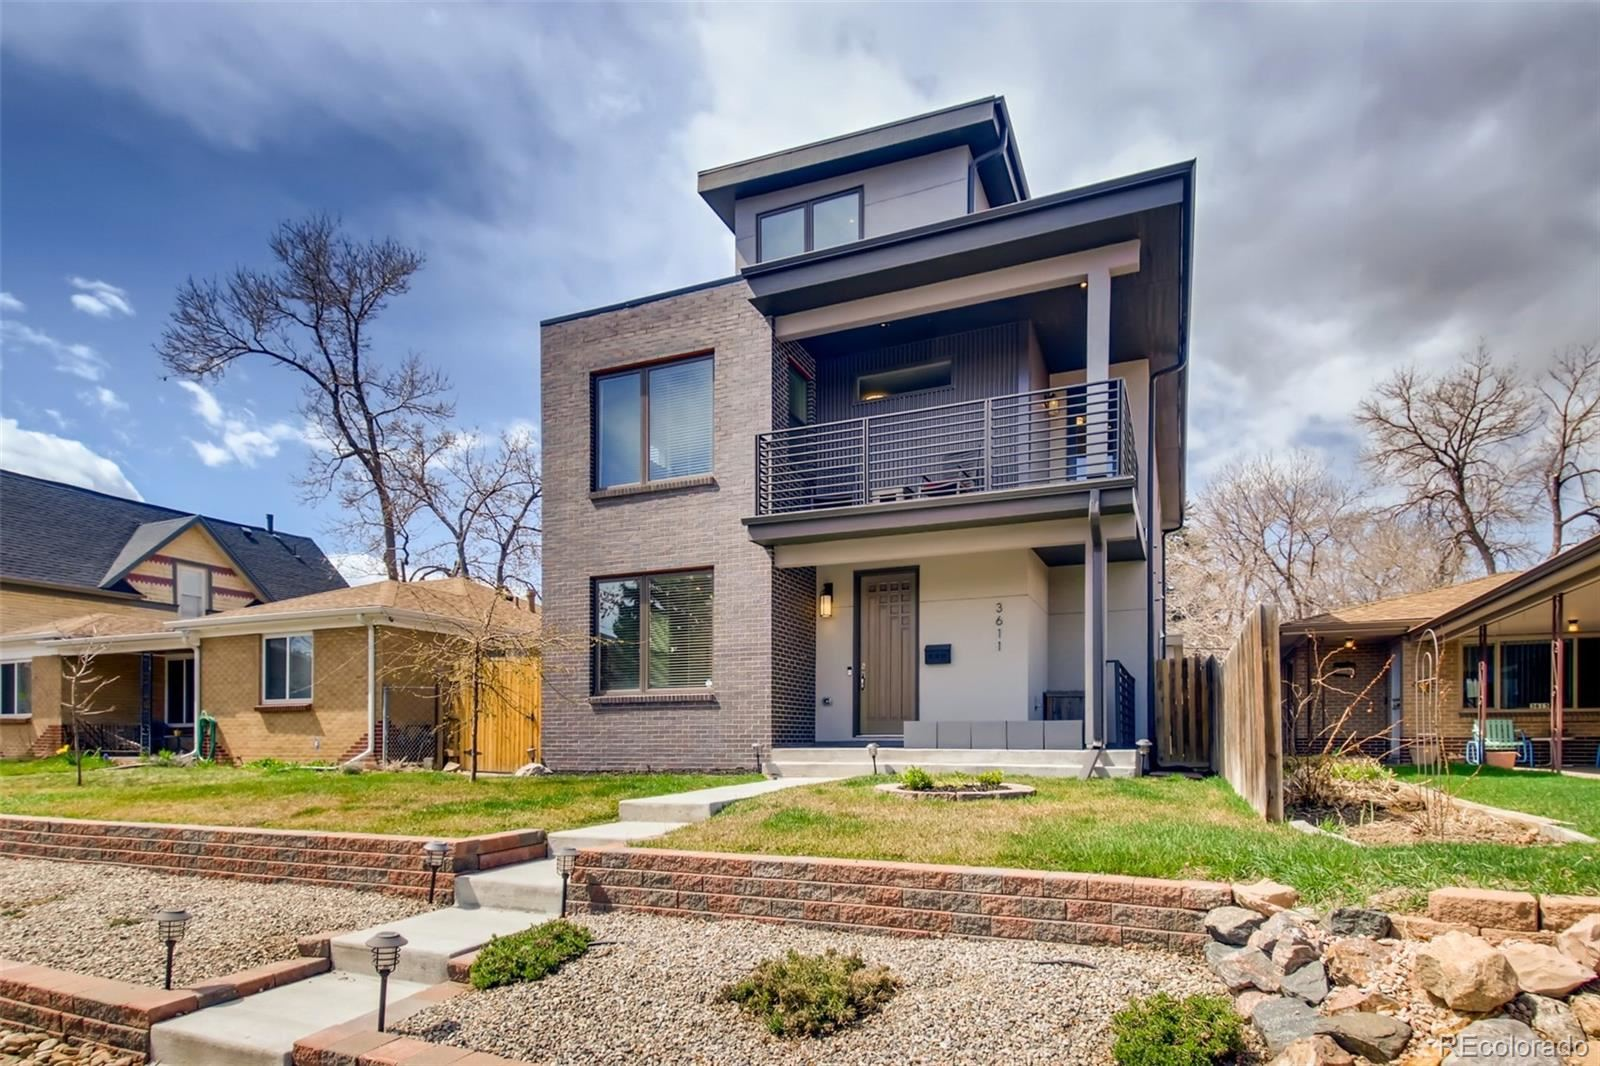 Photo of 3611 Quitman Street, Denver, CO 80212 (MLS # 8604445)